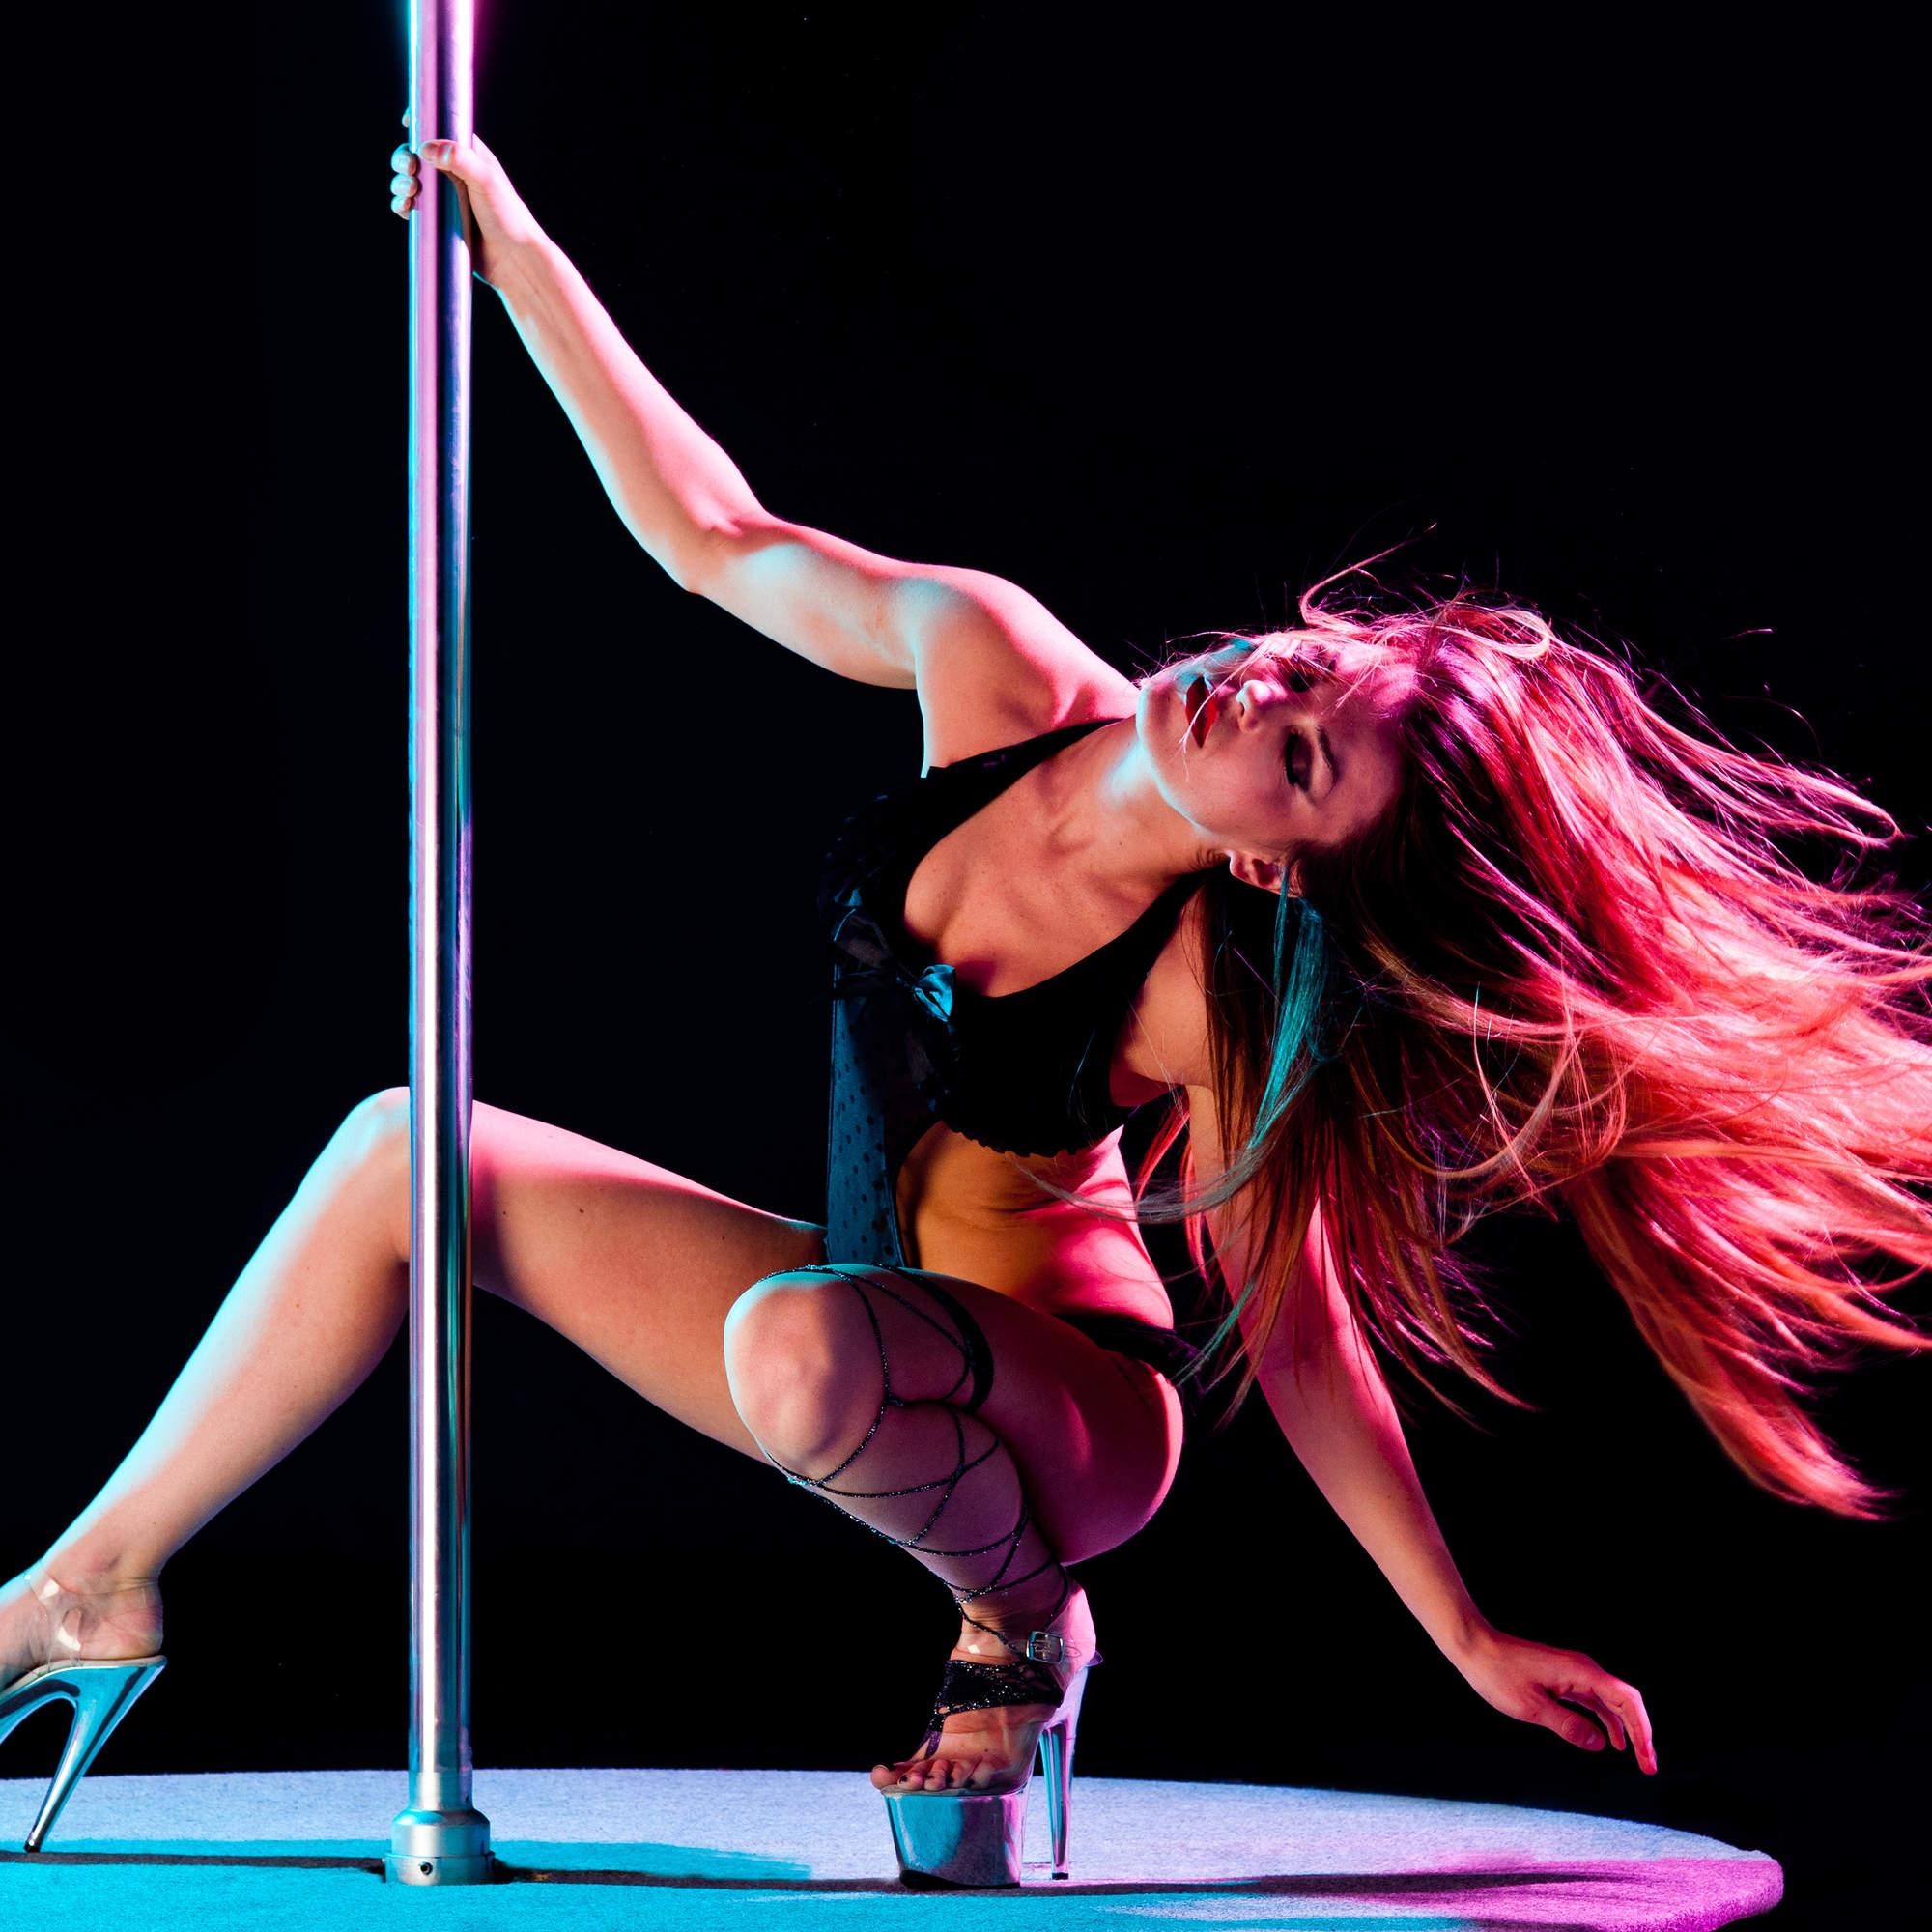 Танец с элементами стриптиза 14 фотография